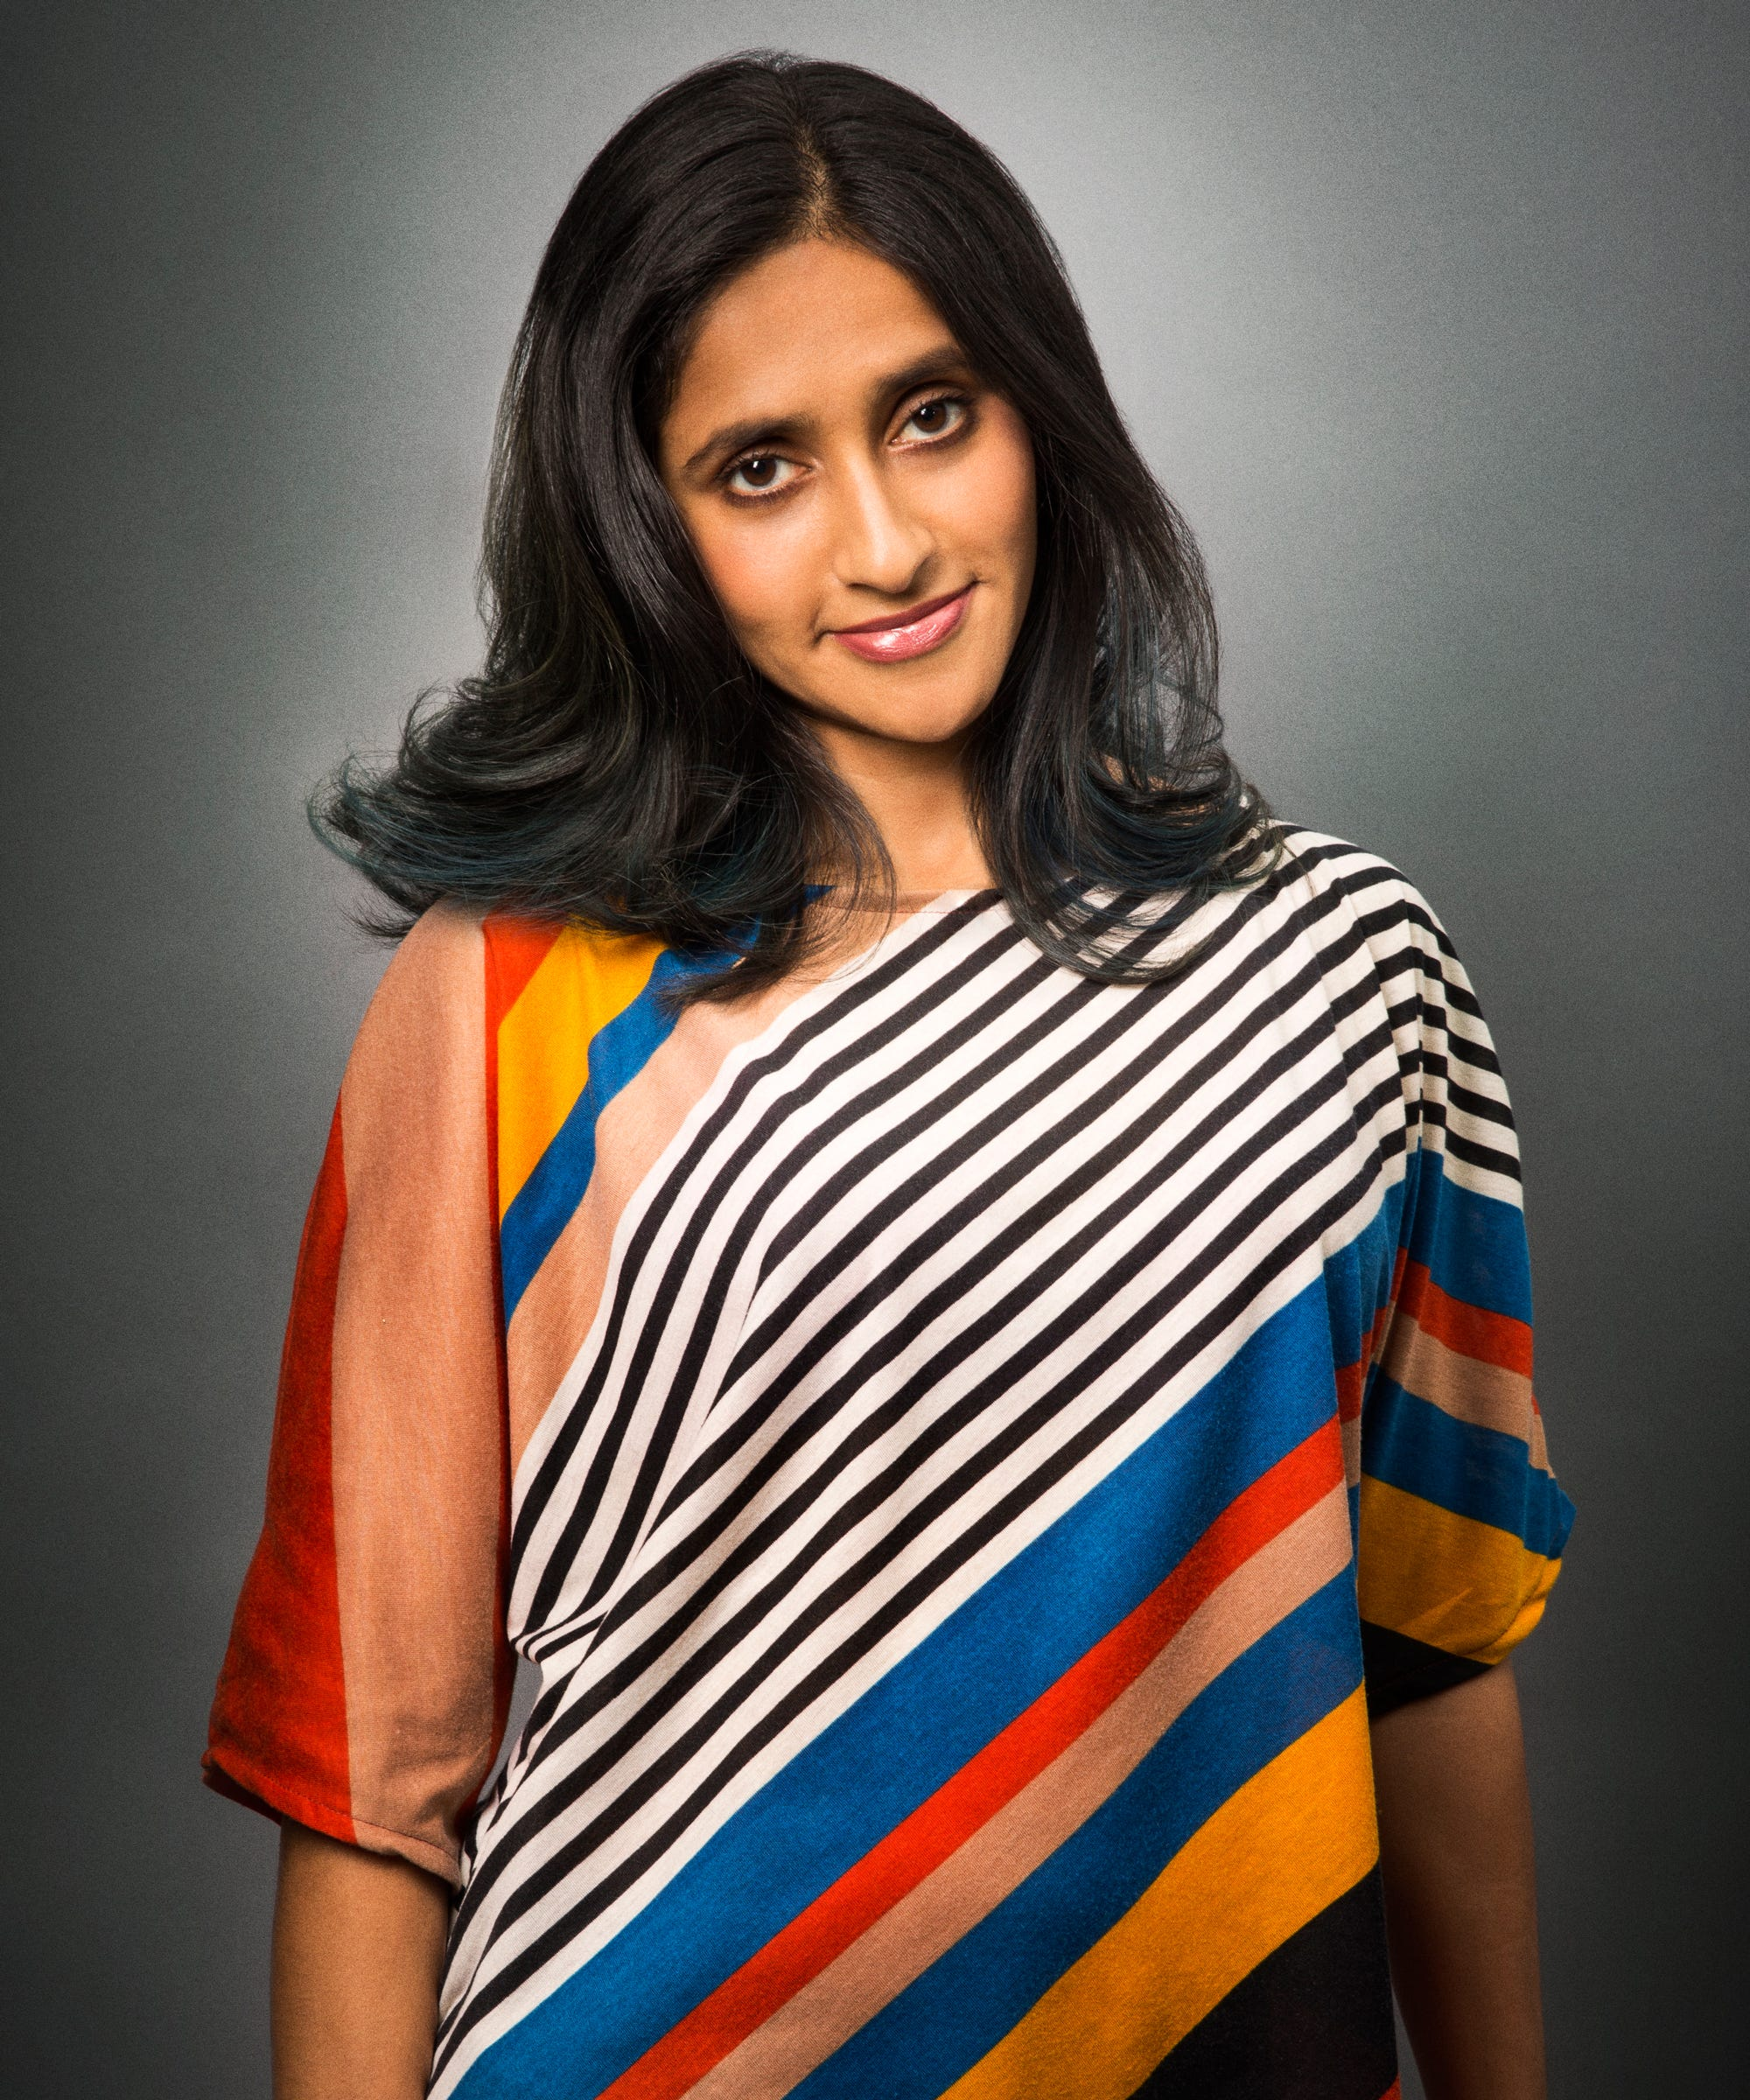 picture Aparna Nancherla